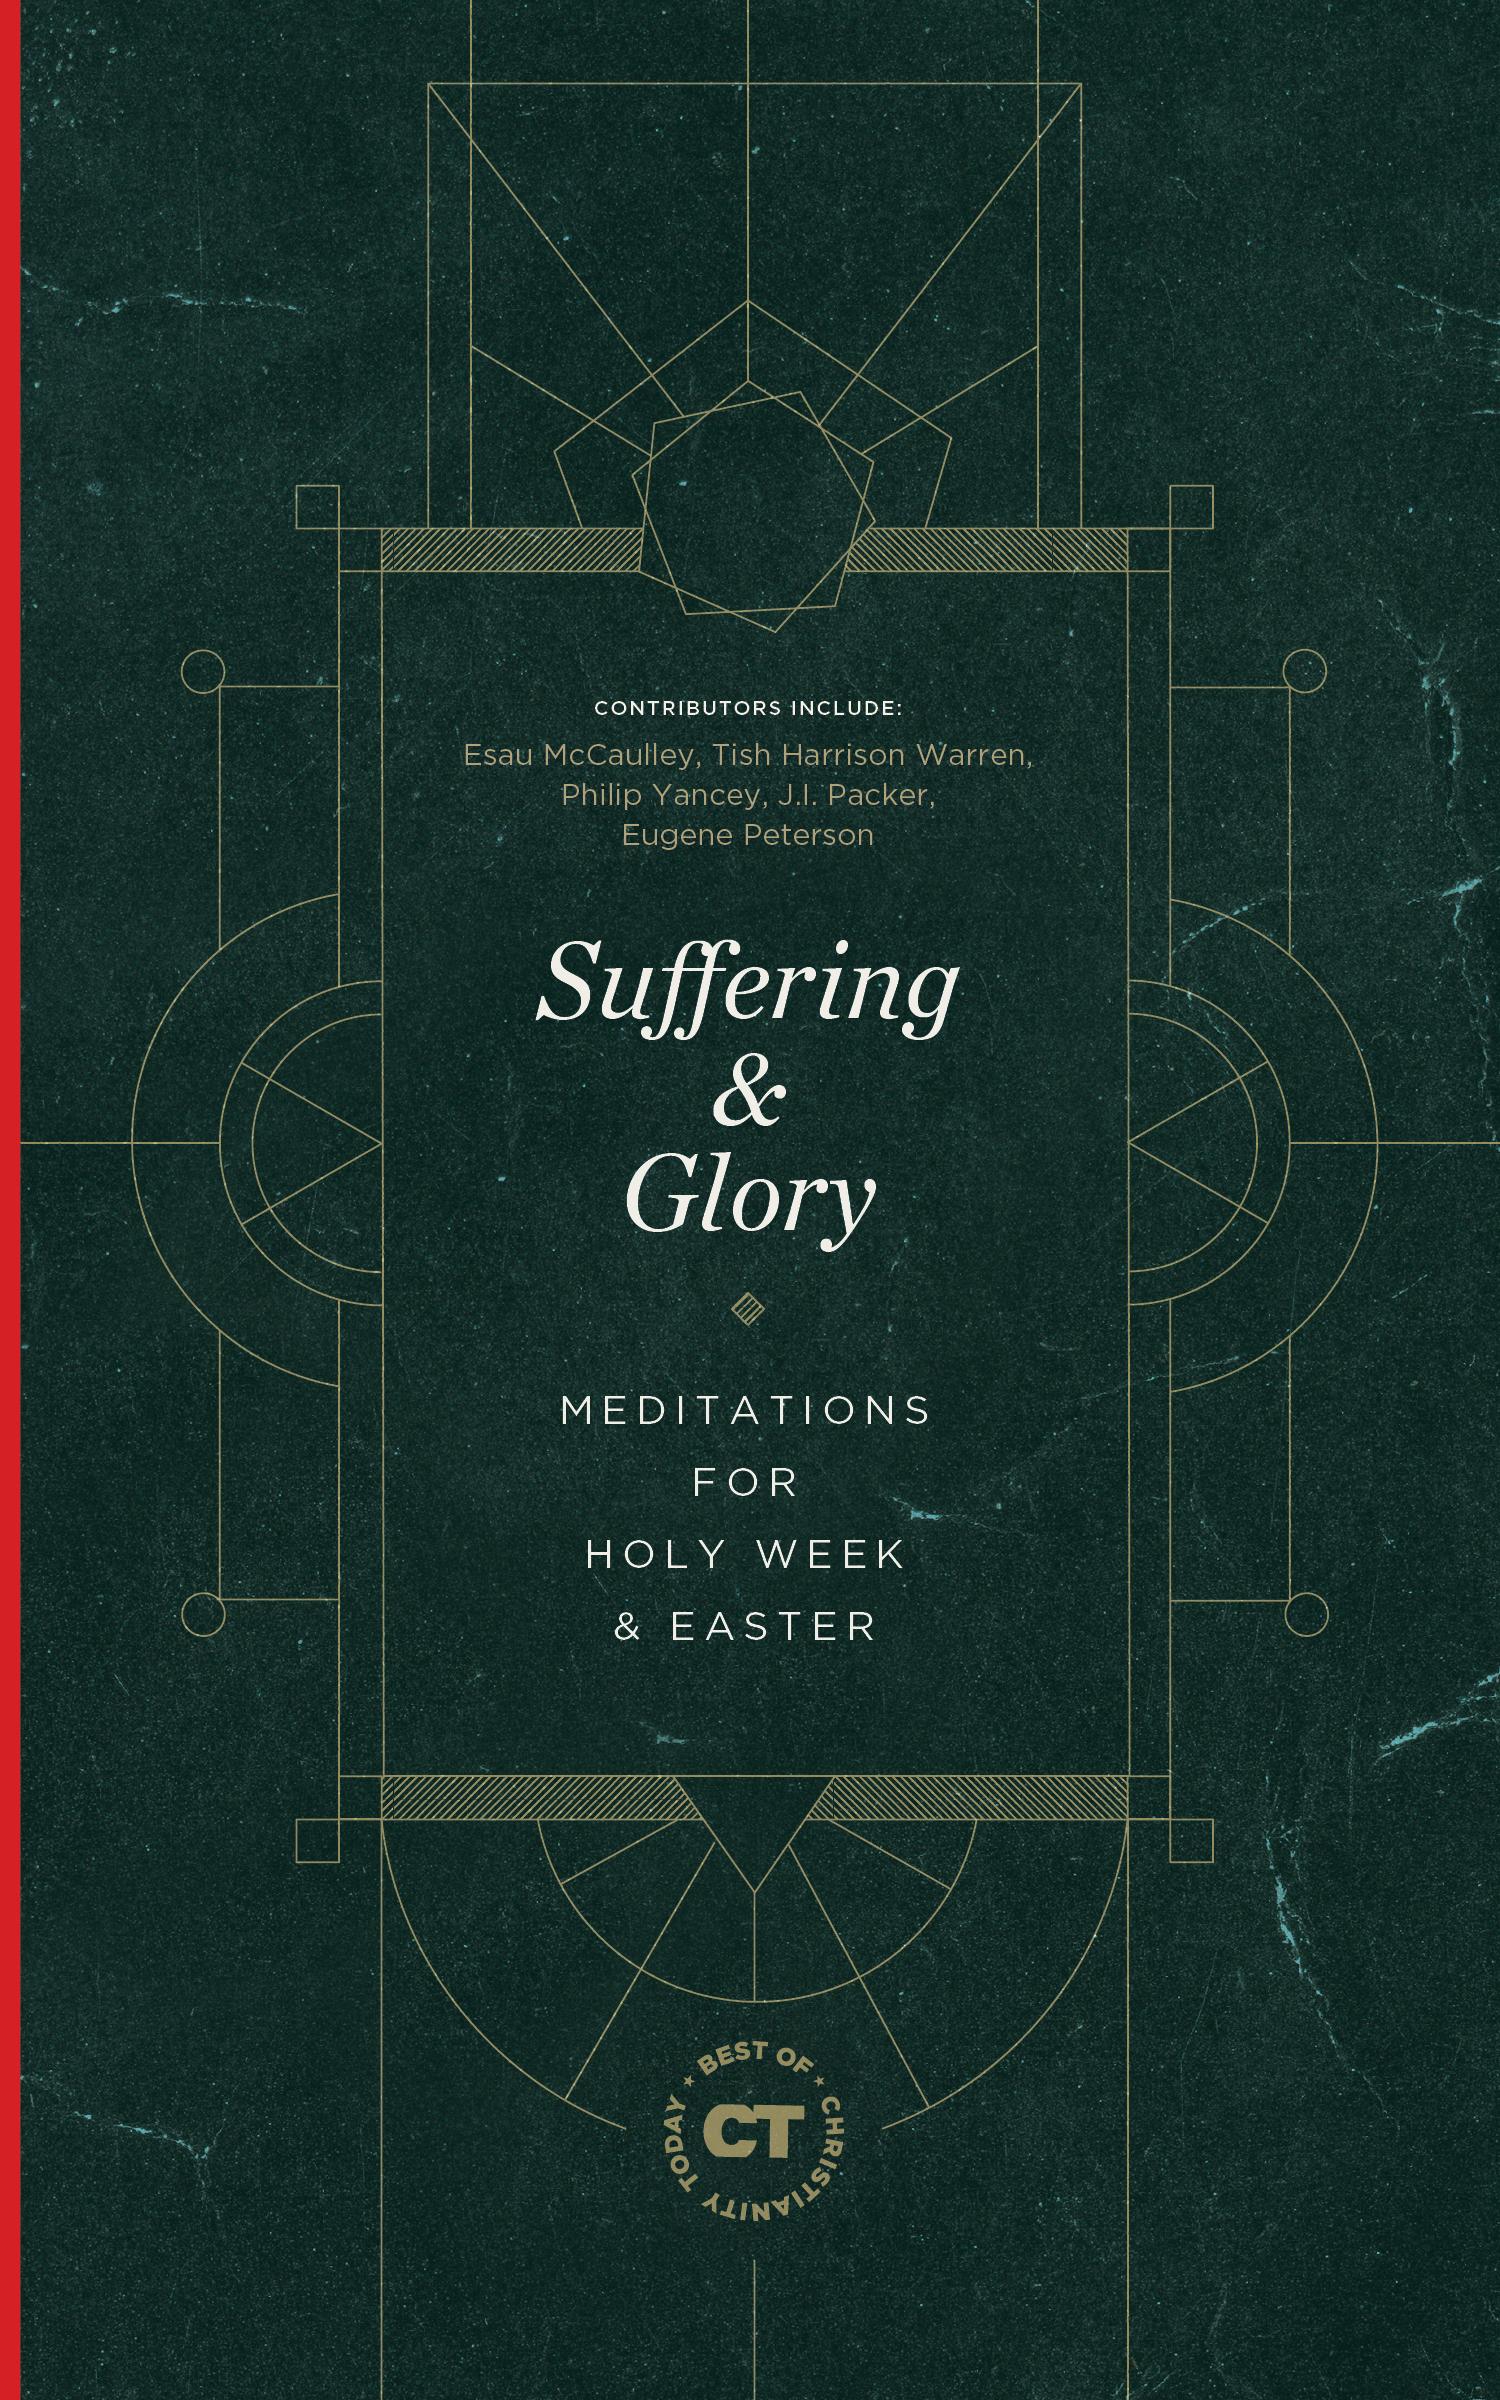 Suffering & Glory